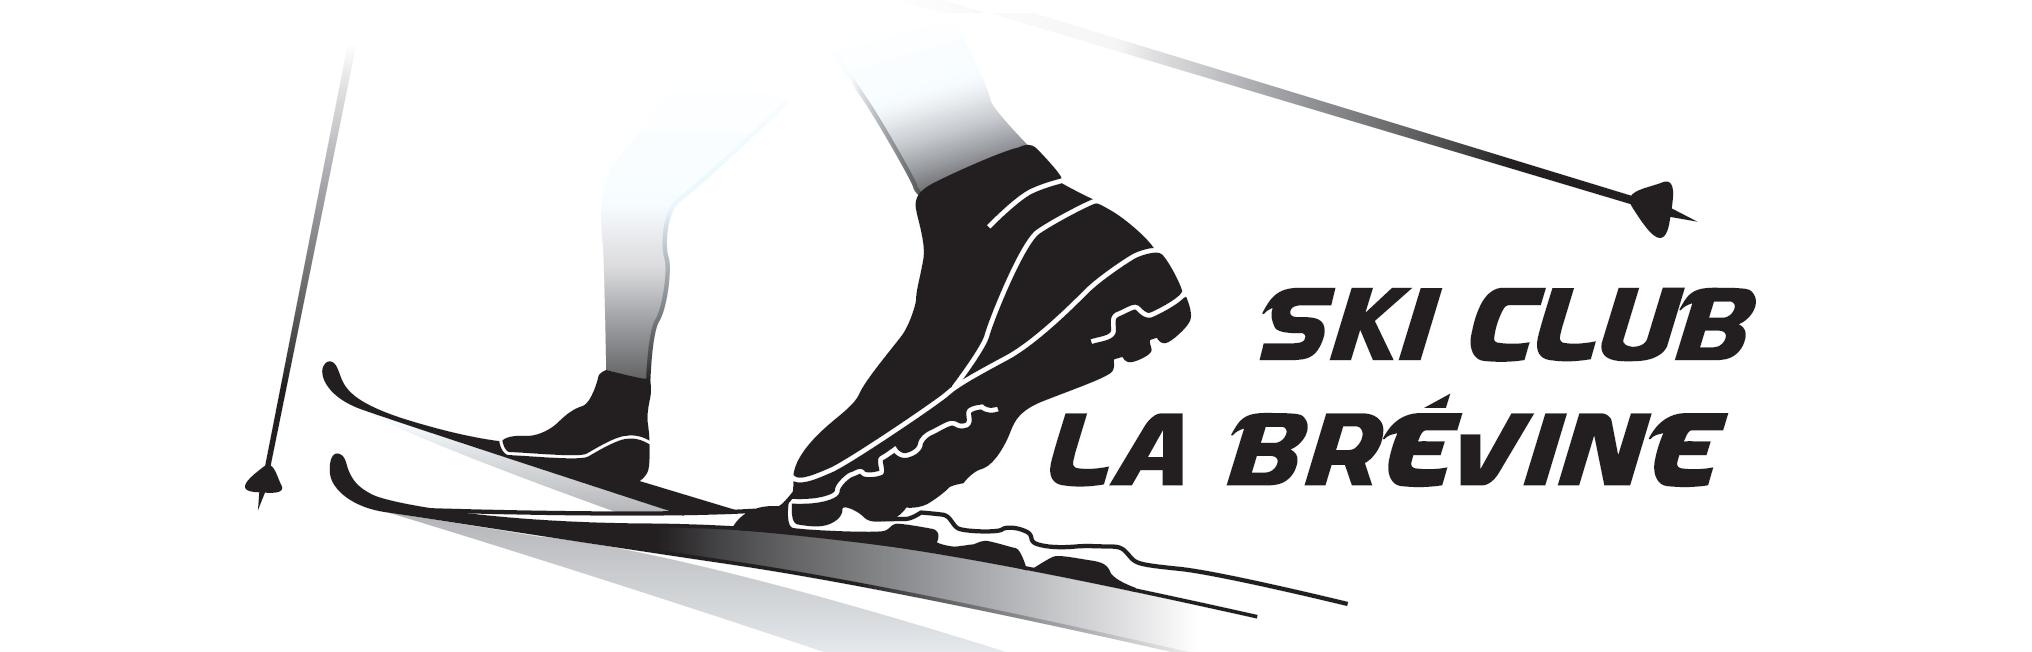 Ski-Club La Brévine